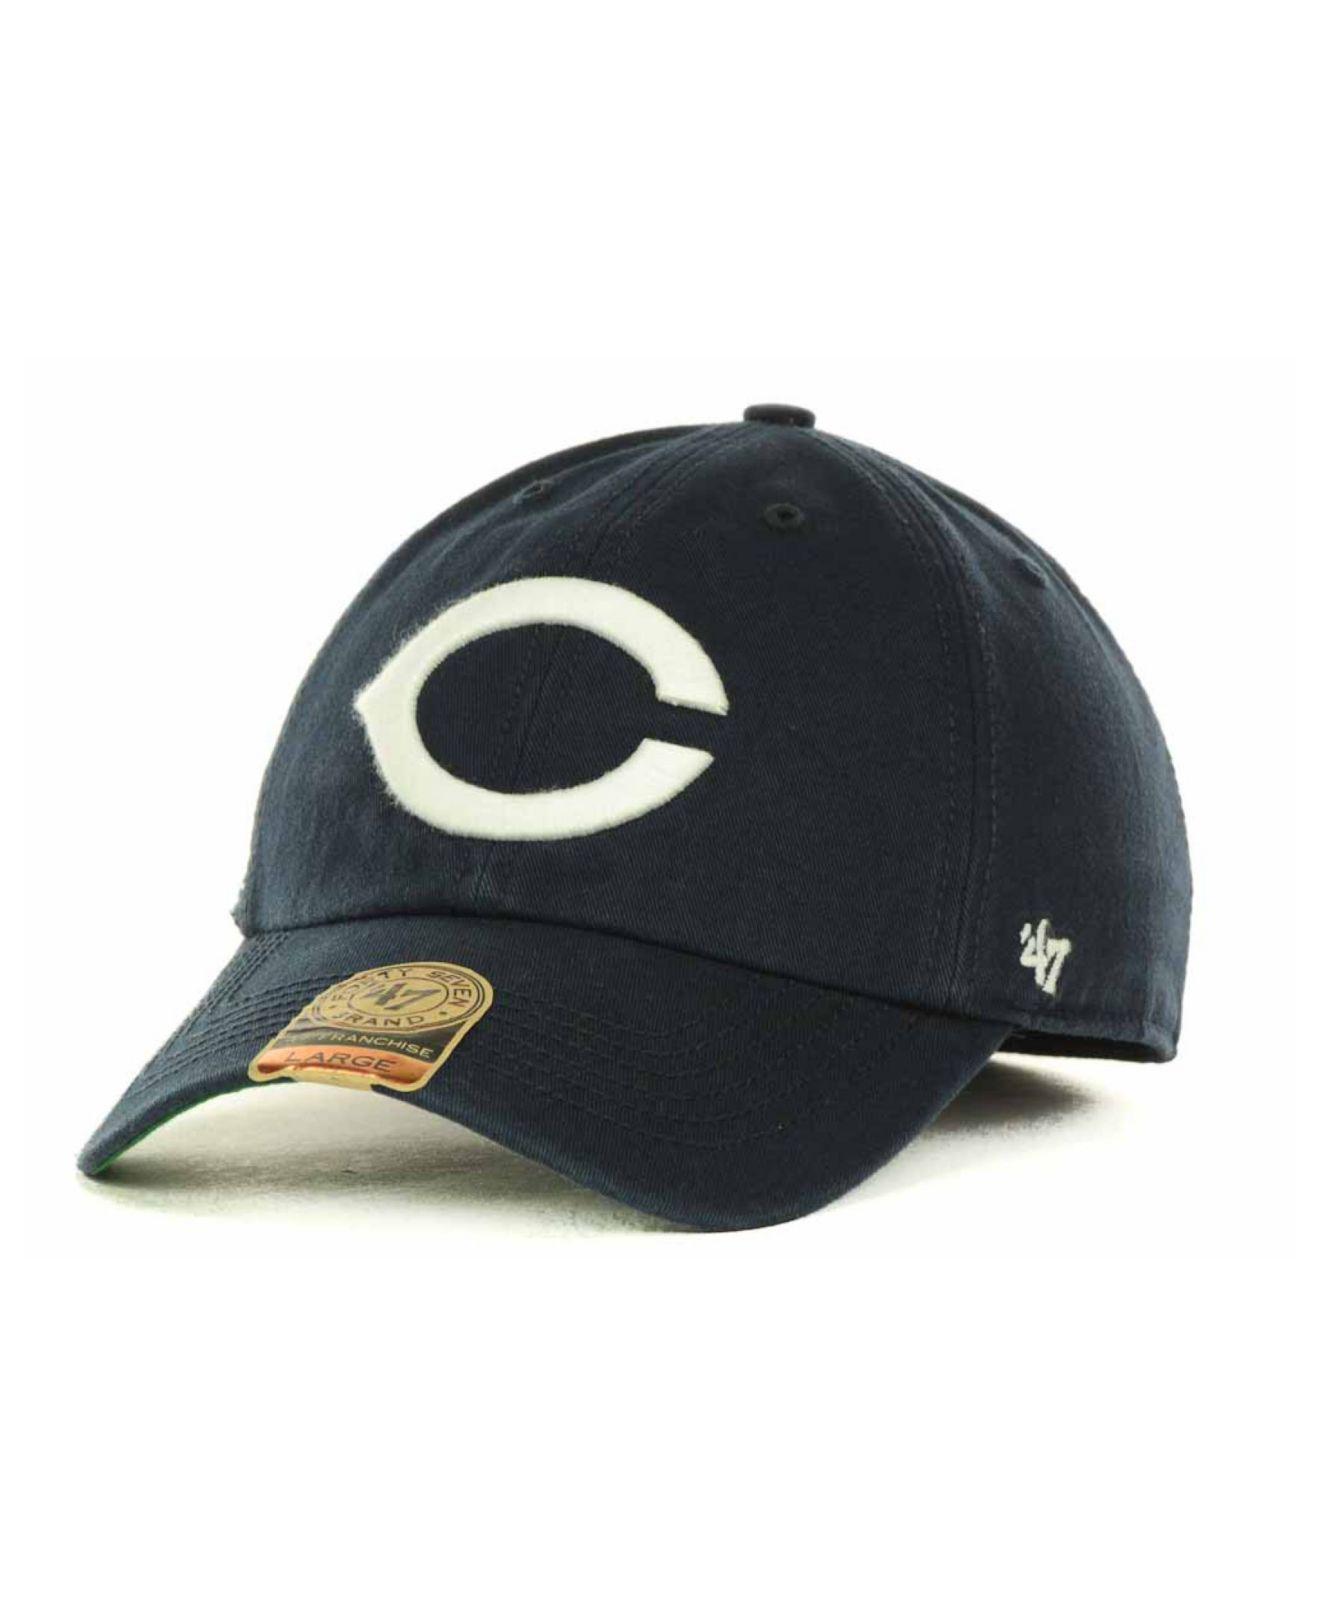 super popular d29eb 55e5e discount underarmour creighton university baseball hat f7e6c a30c5   wholesale 47 brand. mens creighton blue jays franchise cap 0abd0 214f1